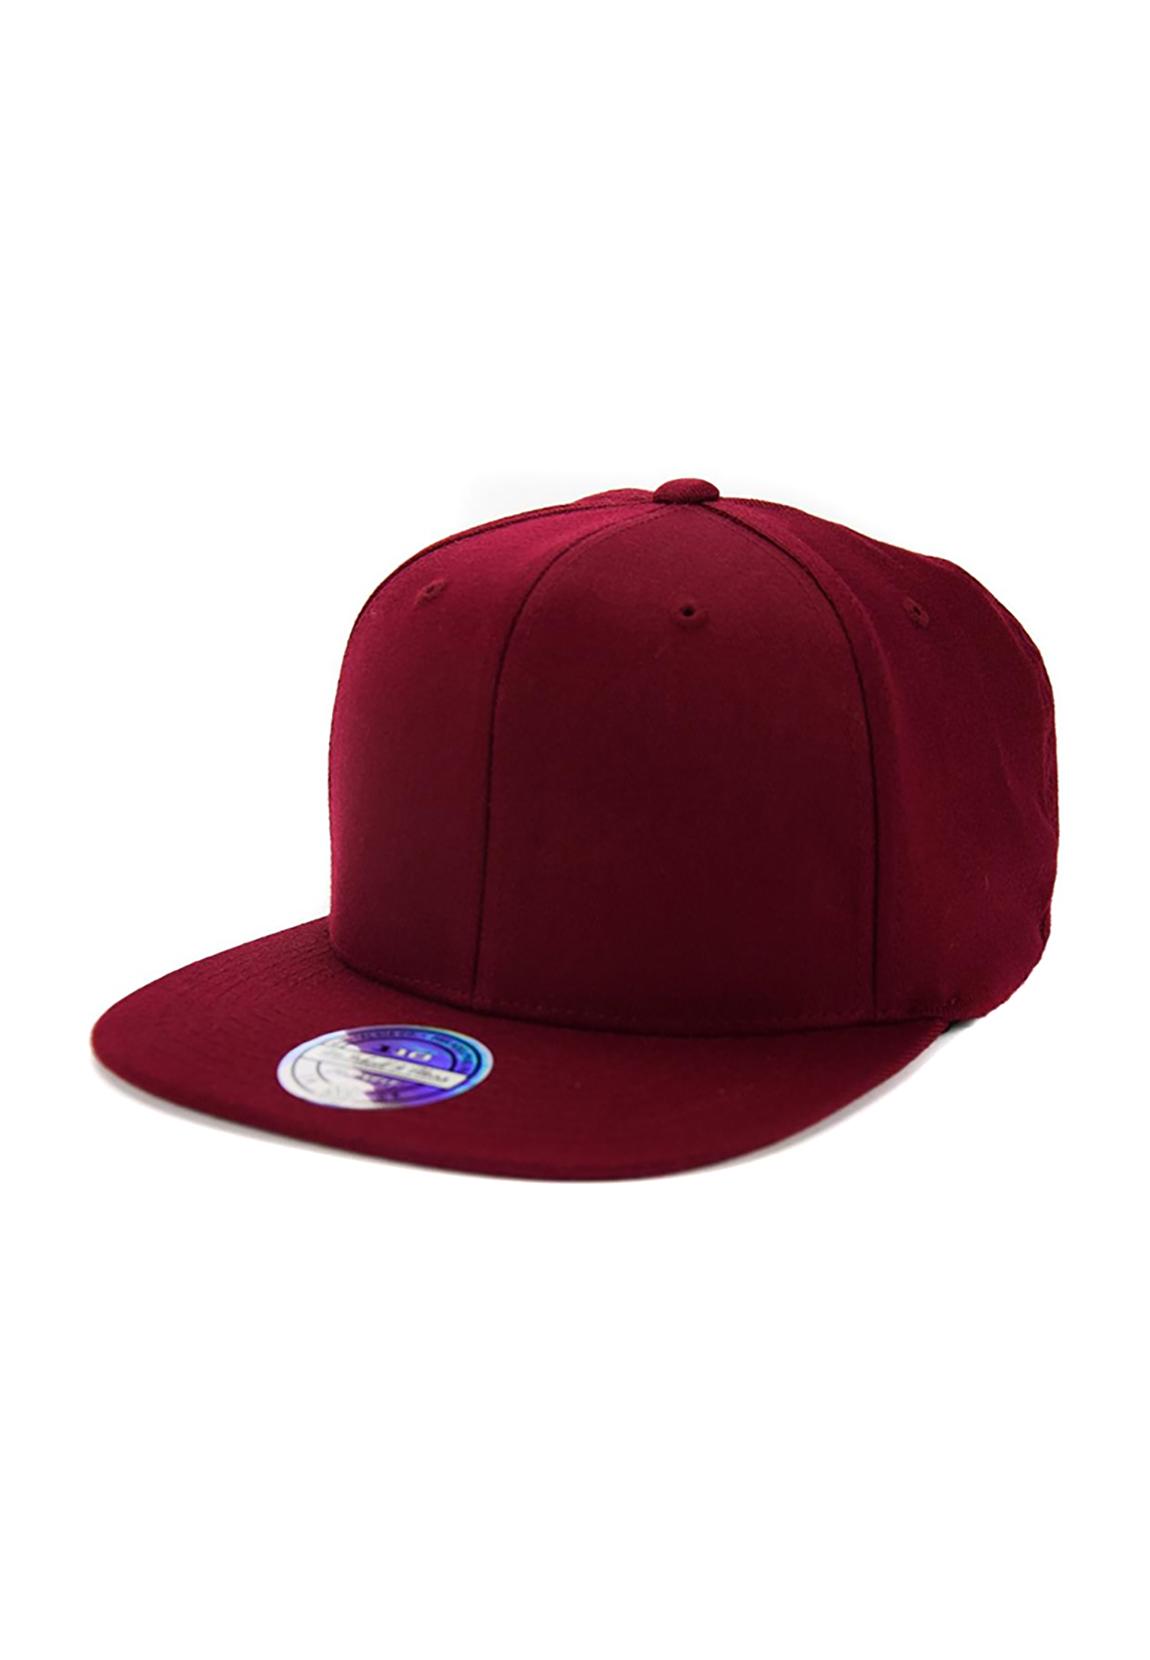 Mitchell   Ness Snapback Cap INTL211 Blank Dark Red  9c749e9b230